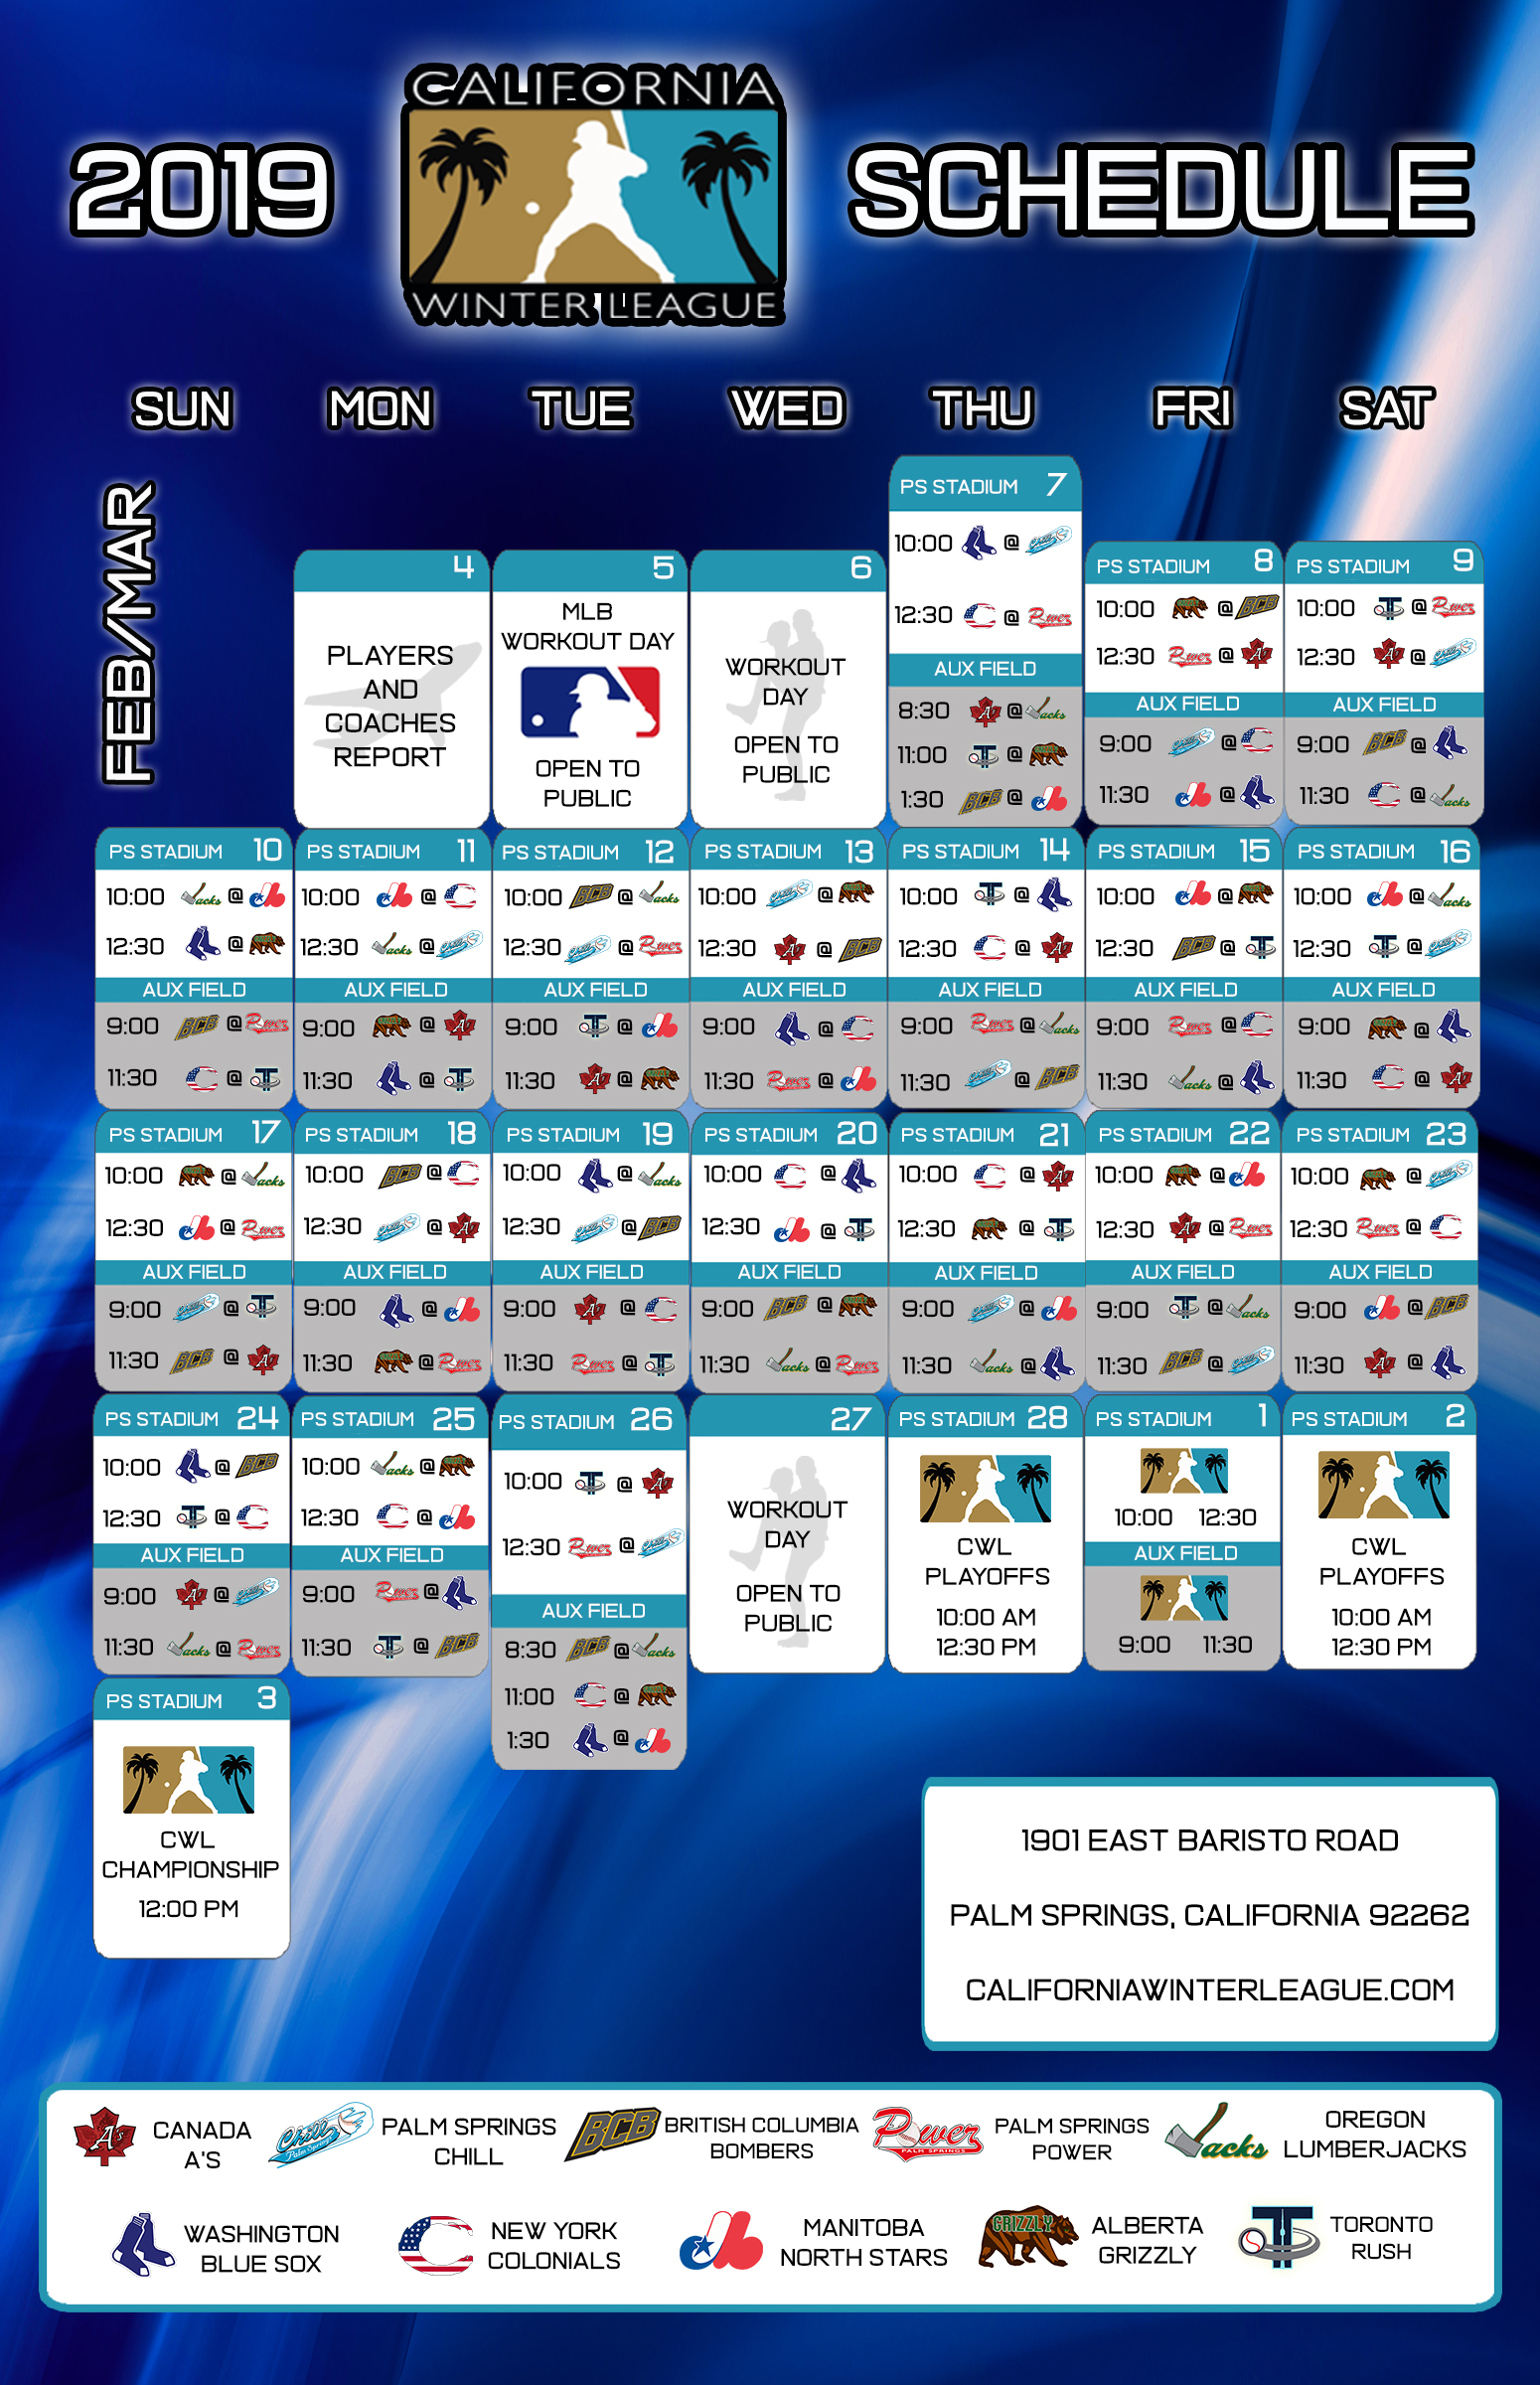 photograph regarding Seattle Mariners Printable Schedule named California Wintertime League 2019 Timetable - California Wintertime